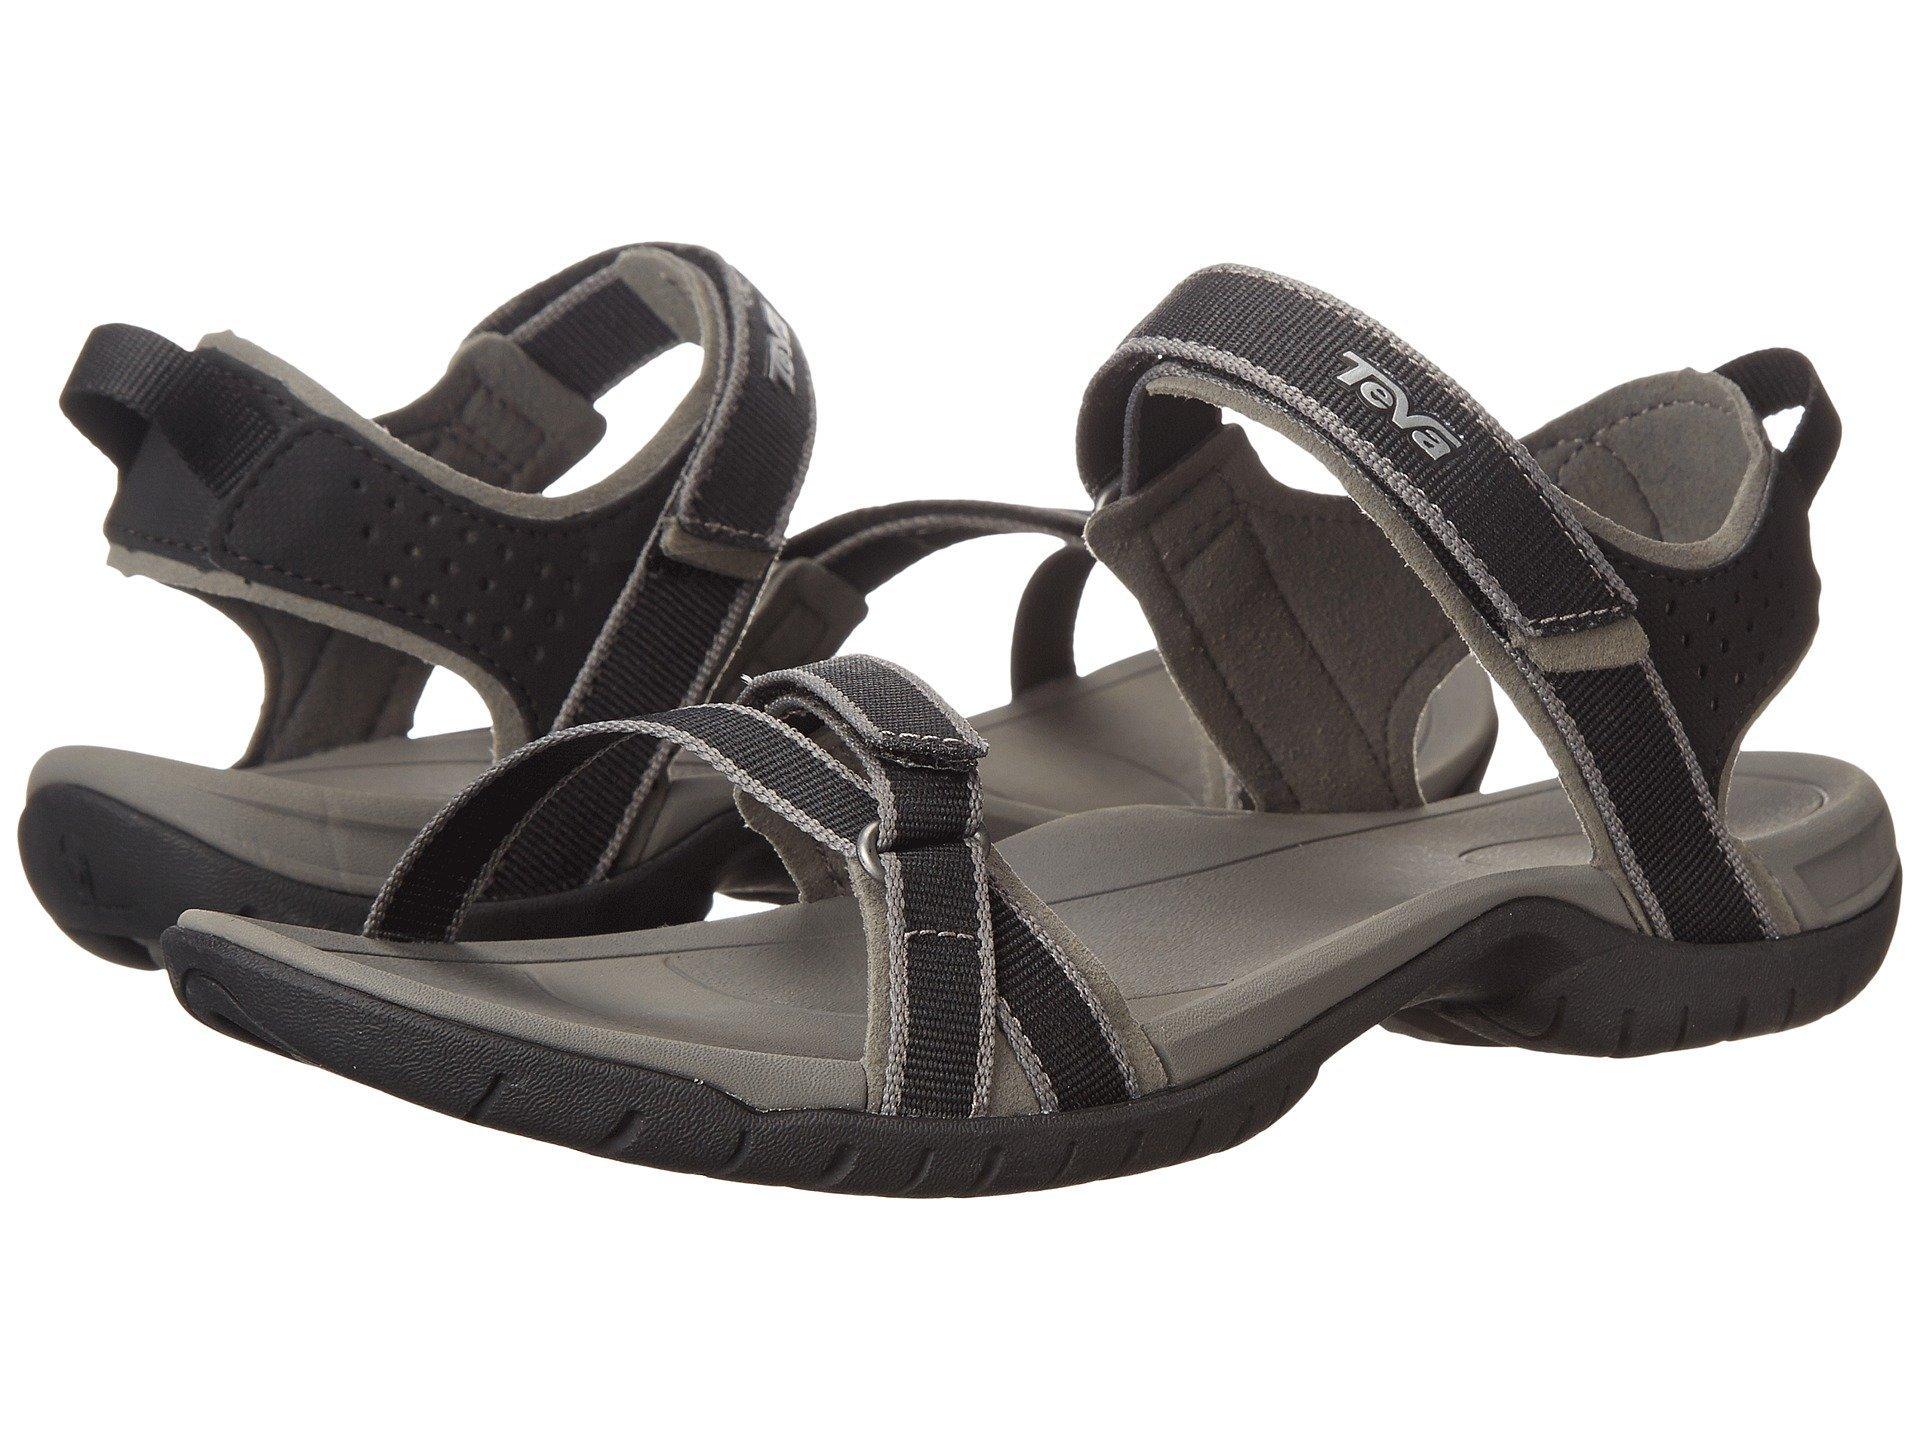 Teva Women's W Verra Sport Sandal, Black, 8 M US